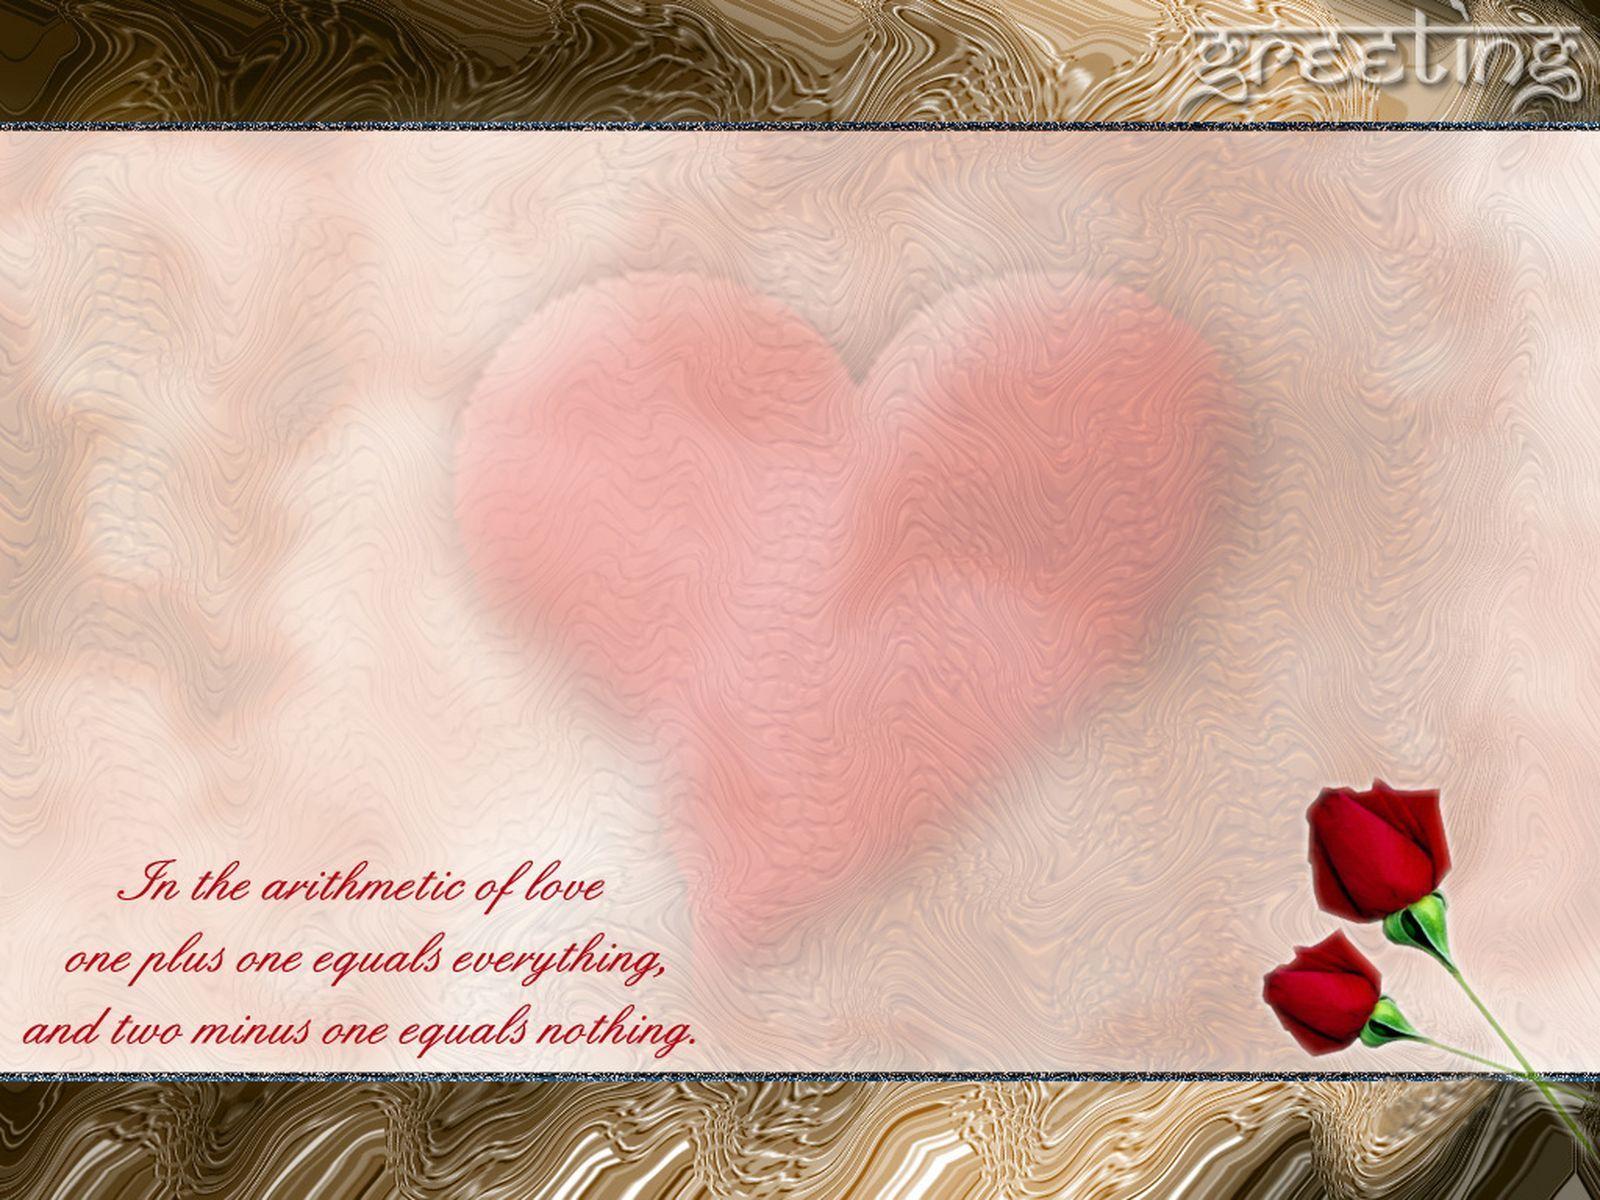 http://4.bp.blogspot.com/-BCj_l_T4Wvw/Ttno-N5GaDI/AAAAAAAAAt0/LTbhtFAXERg/s1600/Love-Wallpaper-love%2Bpicture.jpg